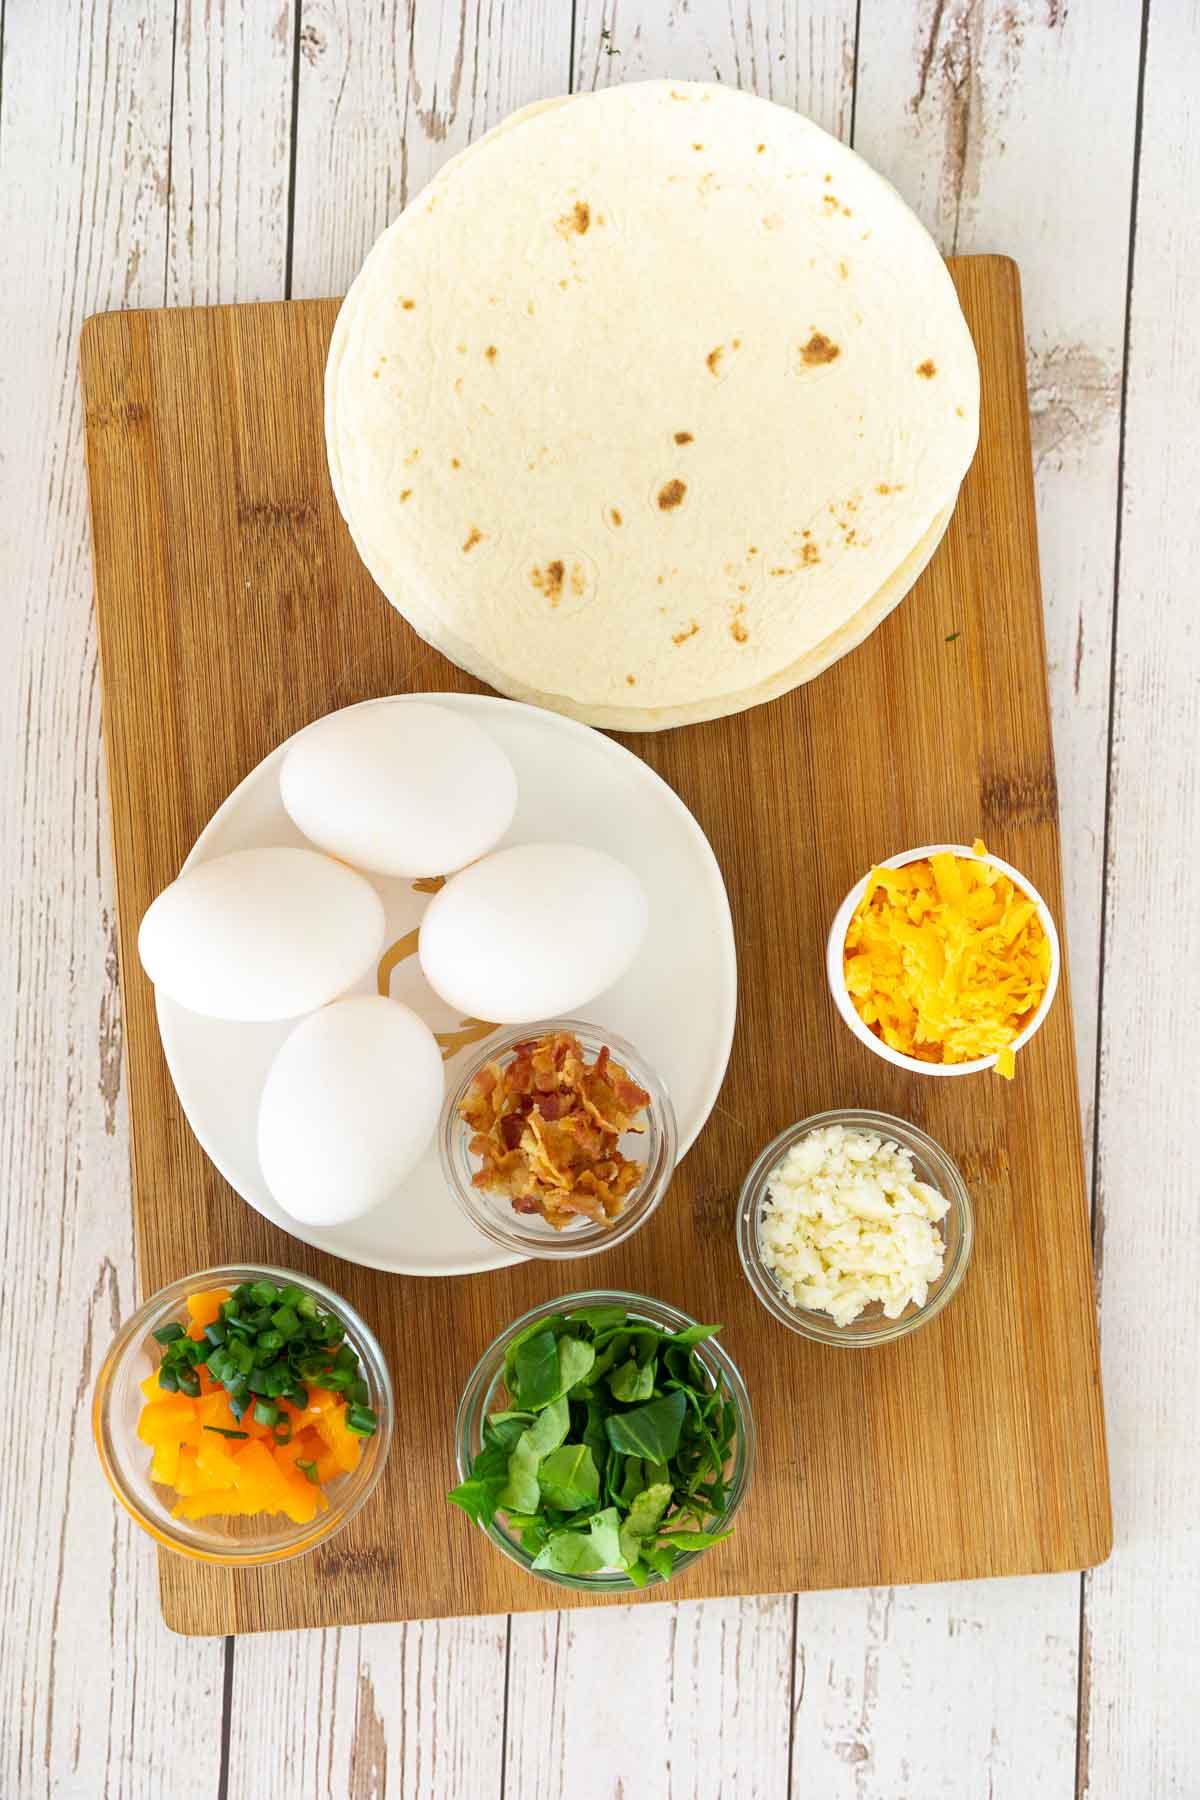 Ingredients to make tortilla egg skillet wraps.